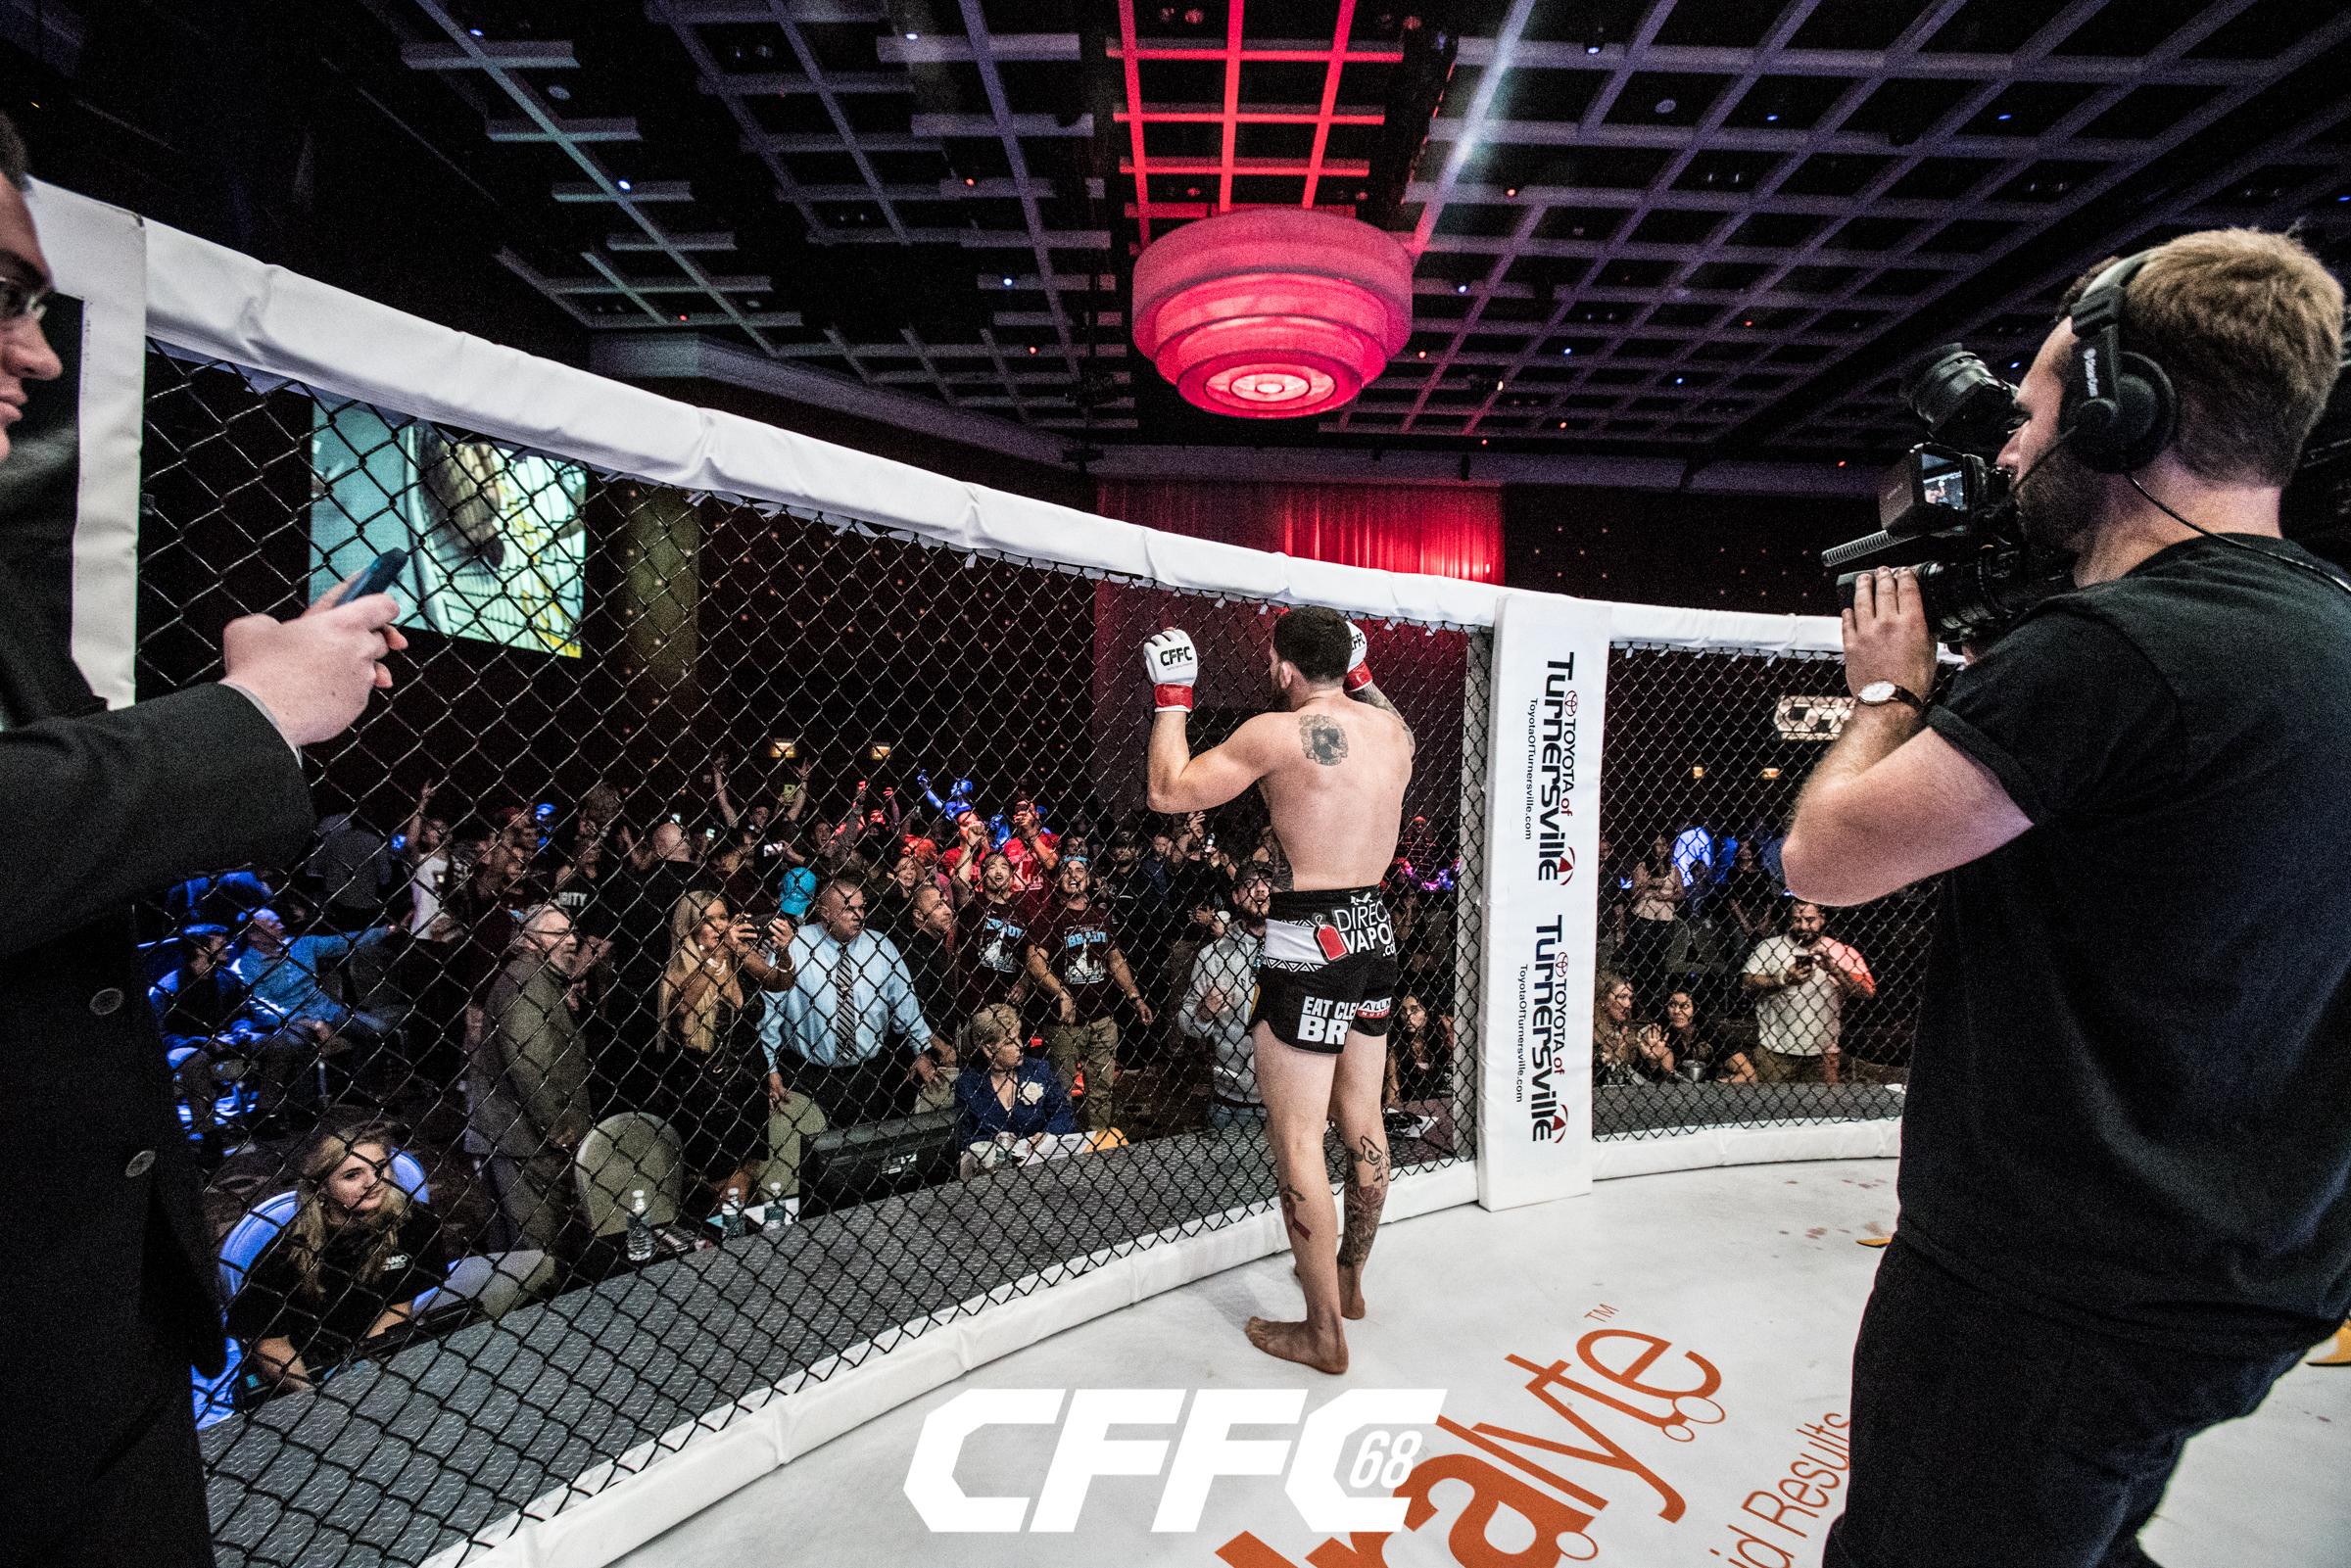 CFFC 68 Fight Night-1-8.jpg